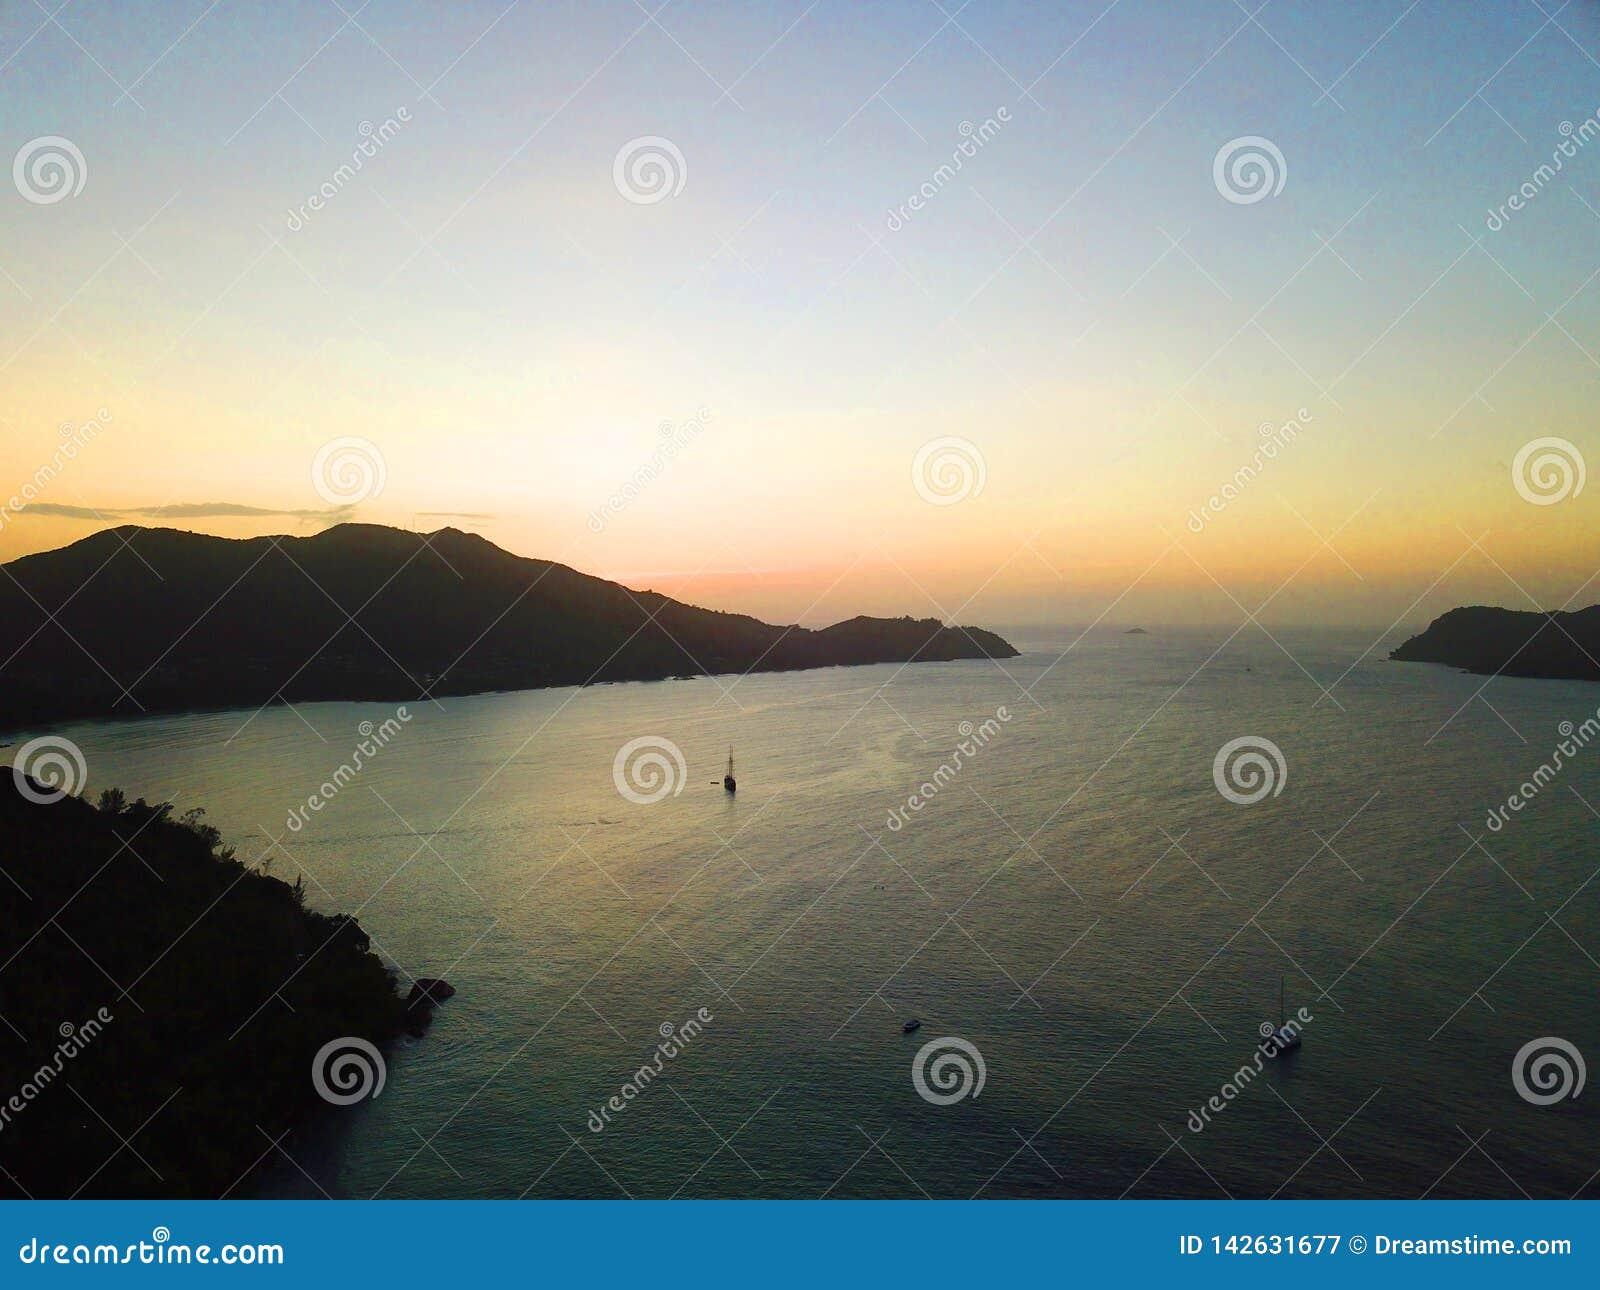 Парусное судно и заход солнца на Сейшельских островах